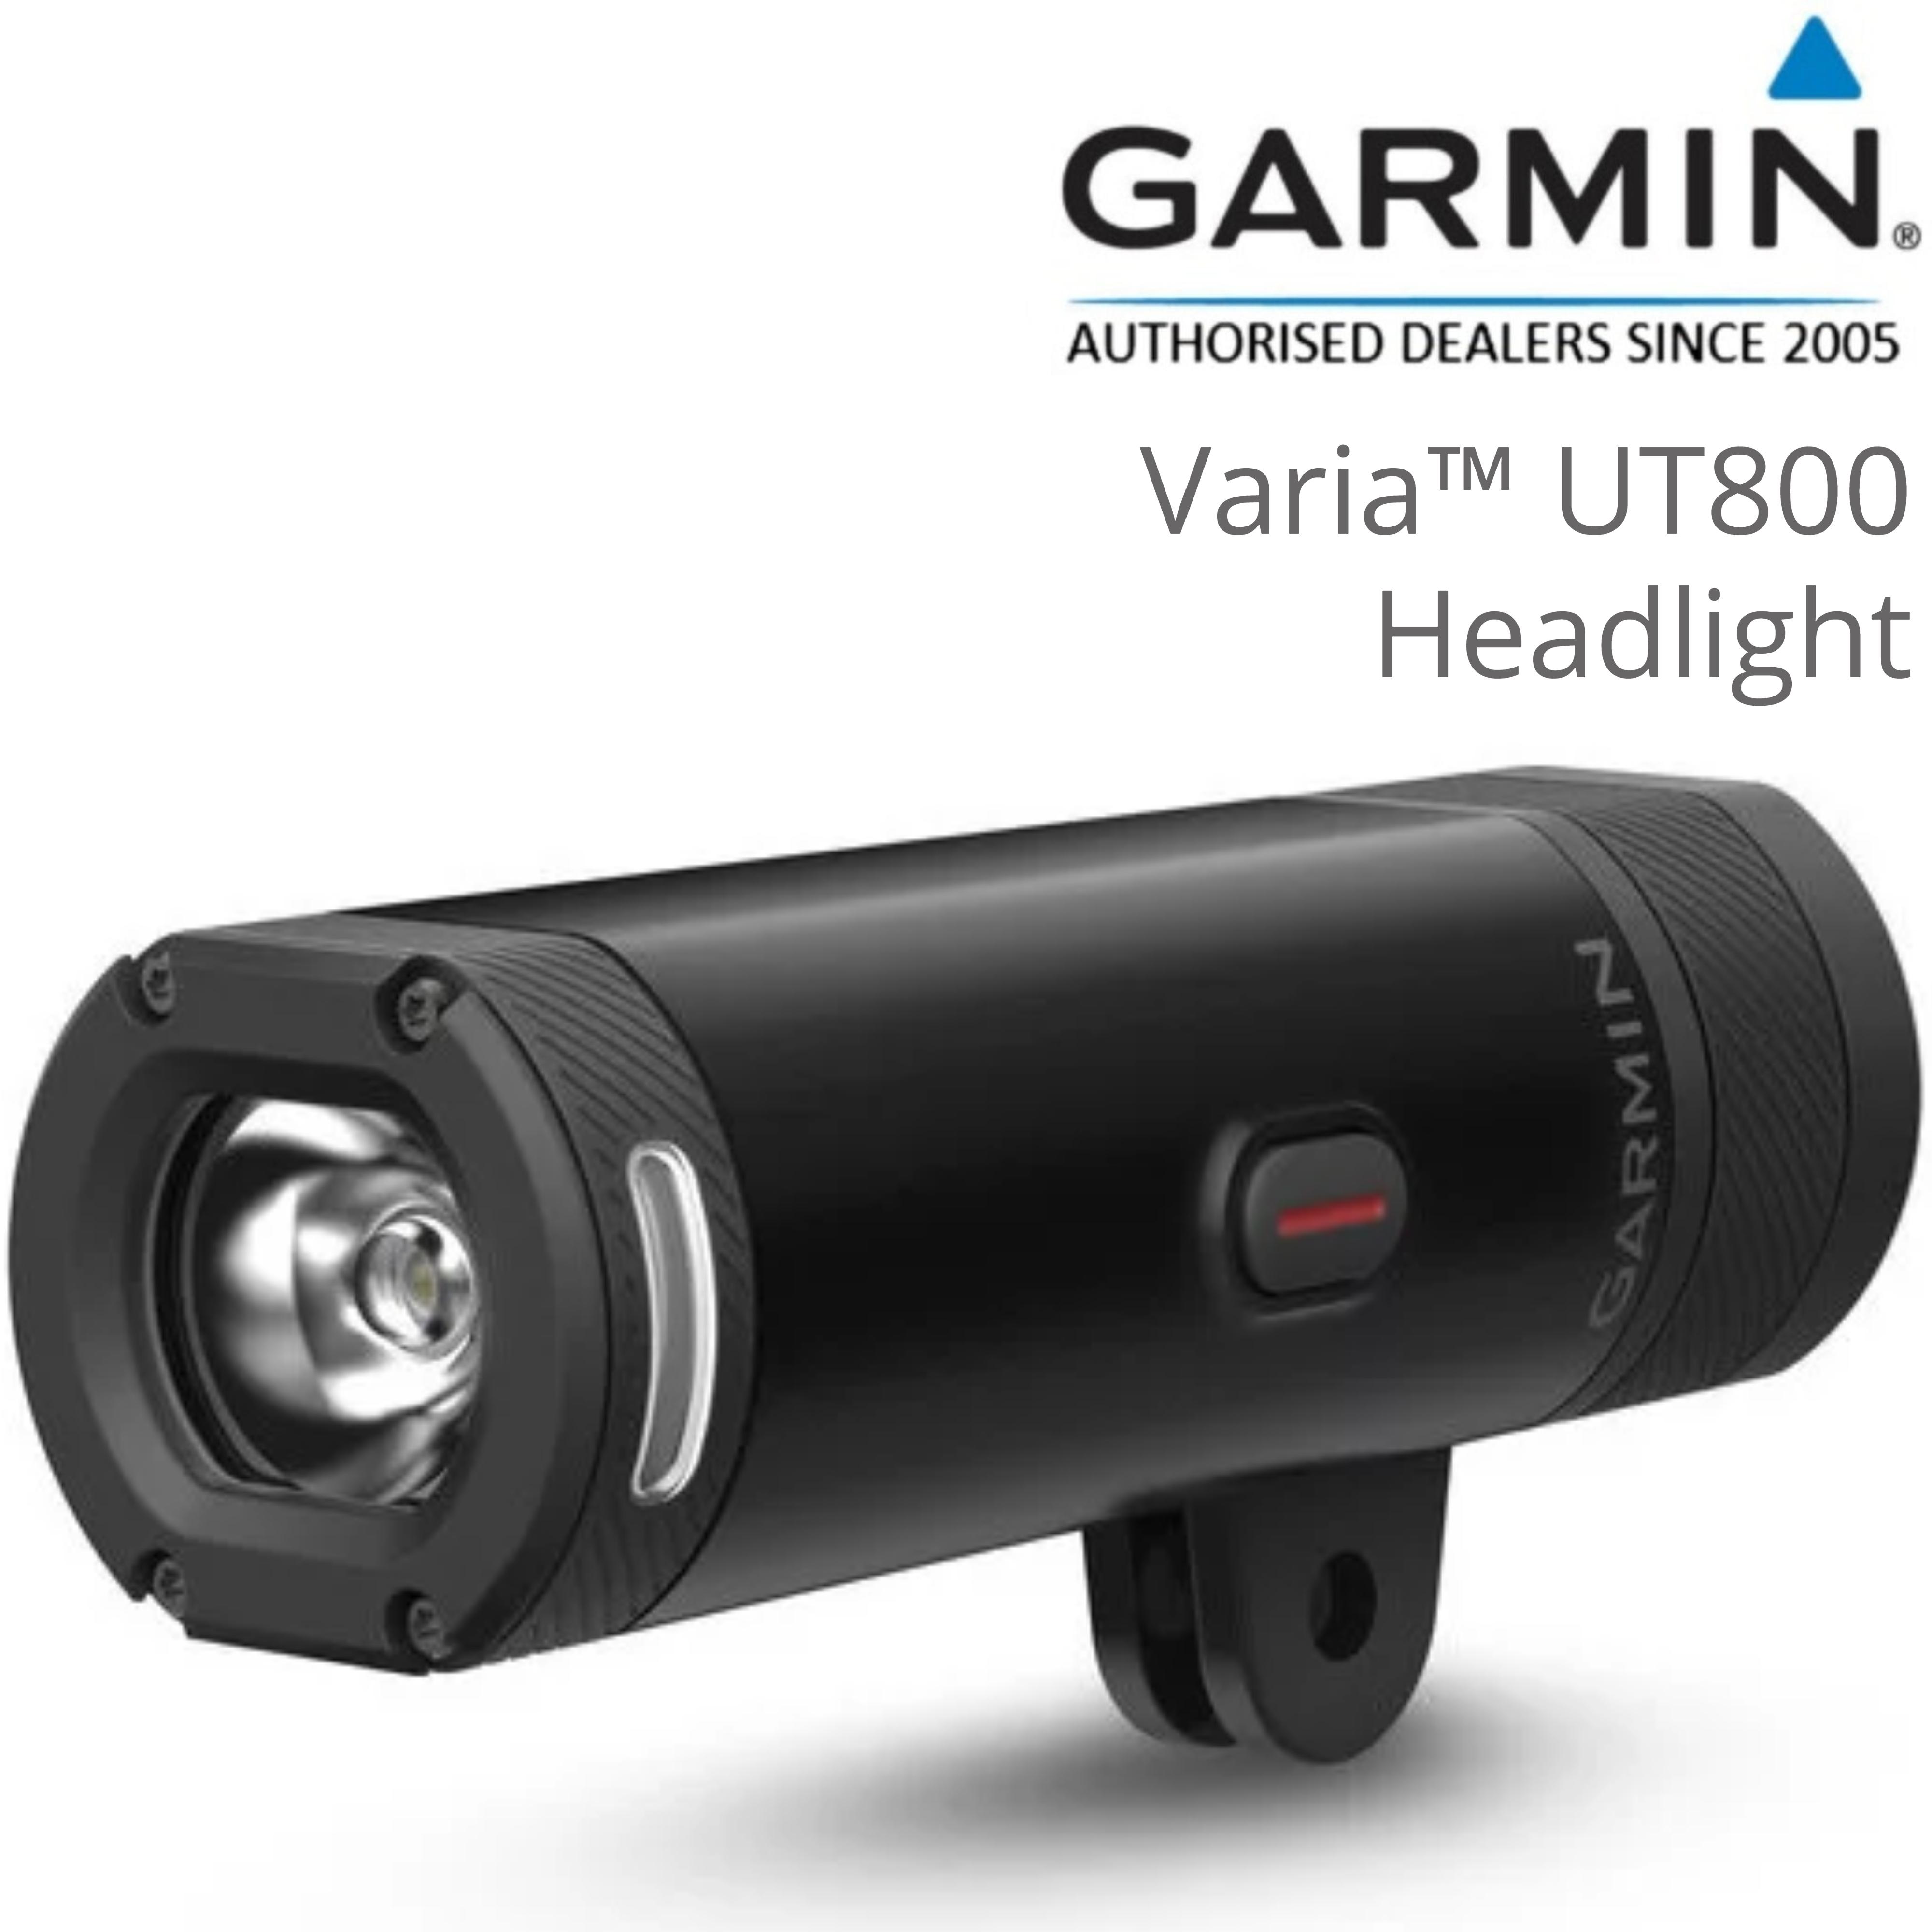 Garmin Varia UT800 Smart Cycling Headlight | Urban Edition | Bike Mounting | 1.6 km